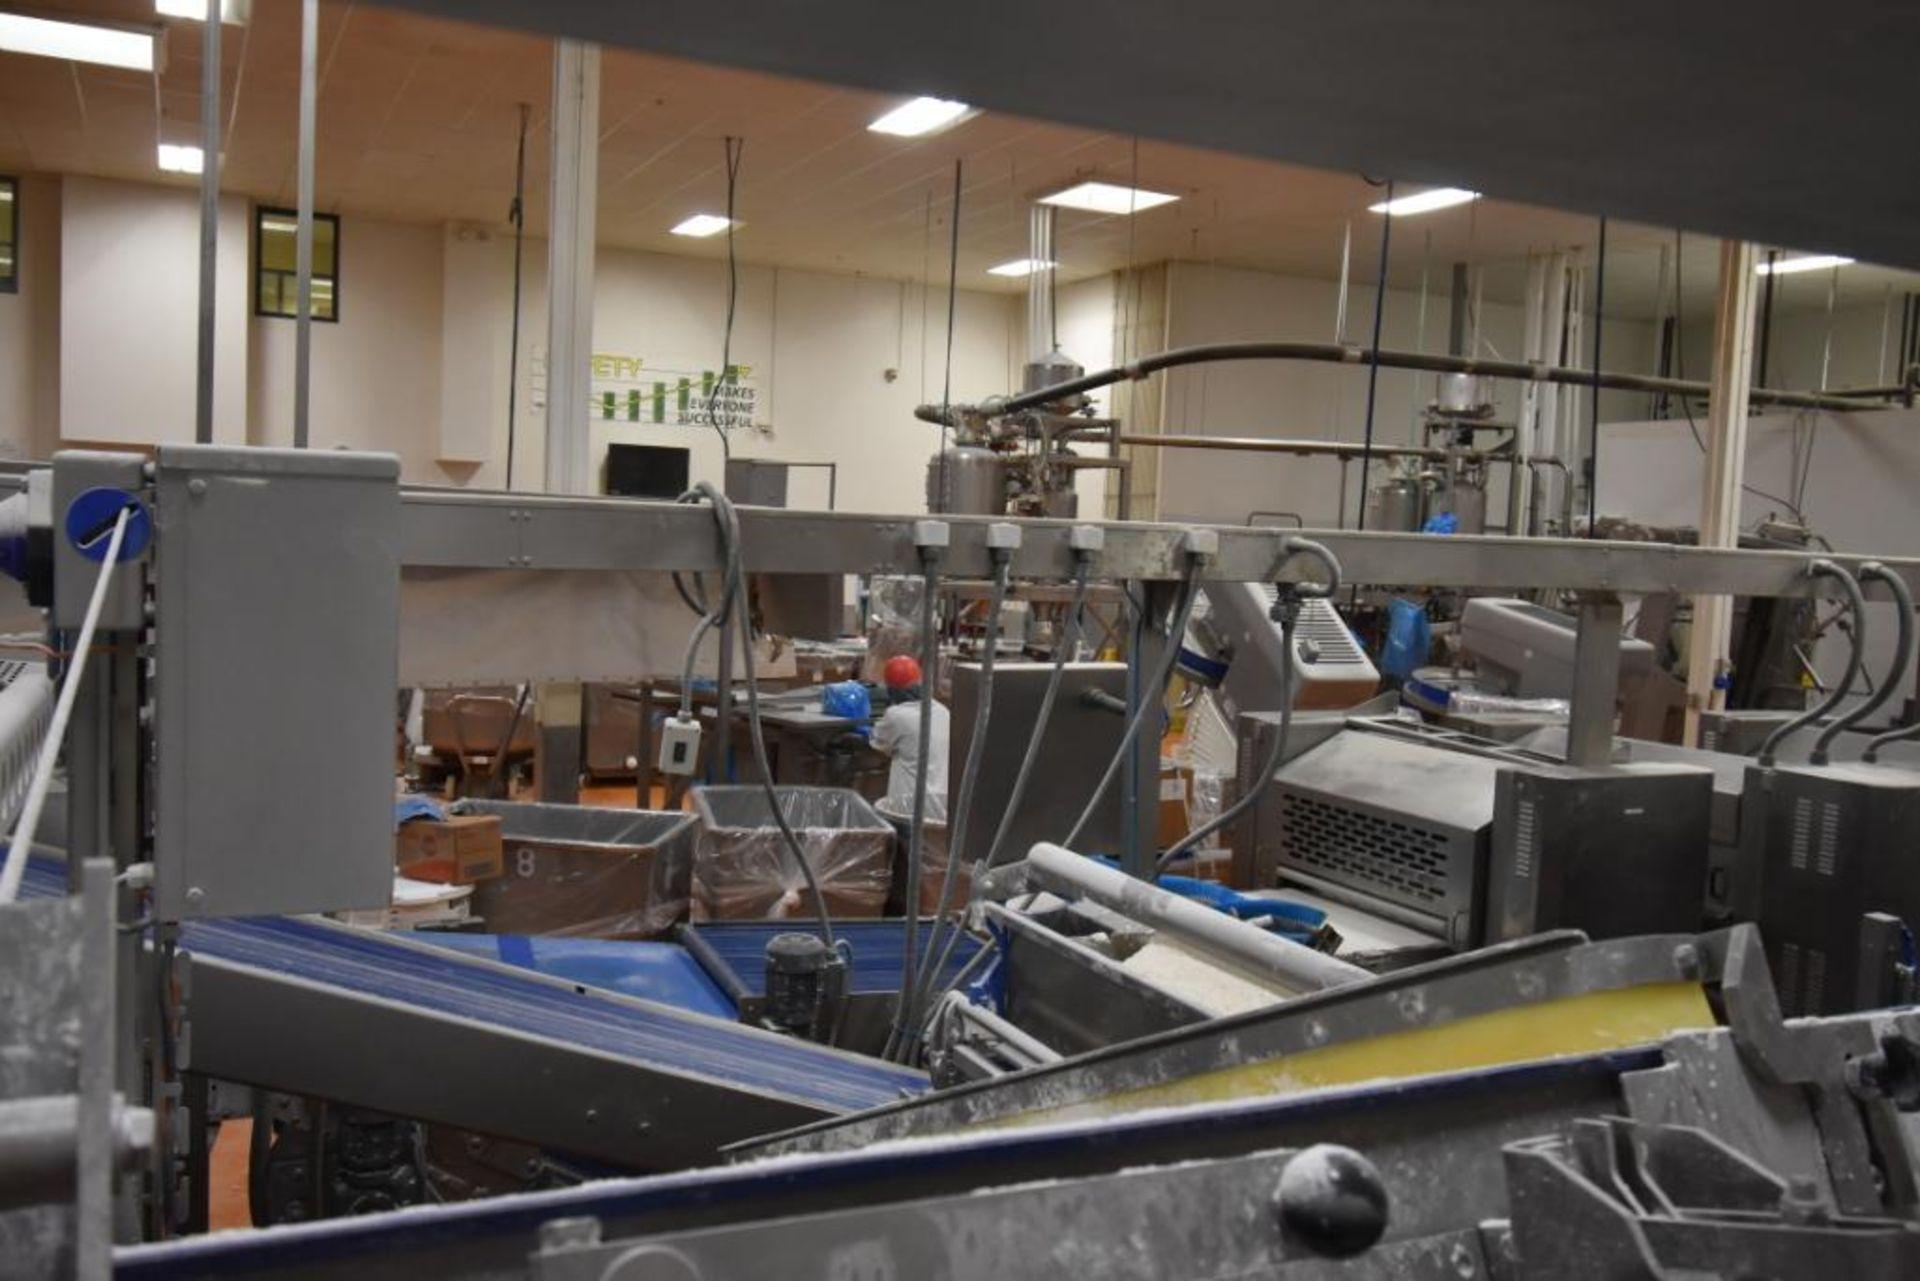 2007 Fritsch Laminator 3000 dough line - Image 113 of 280